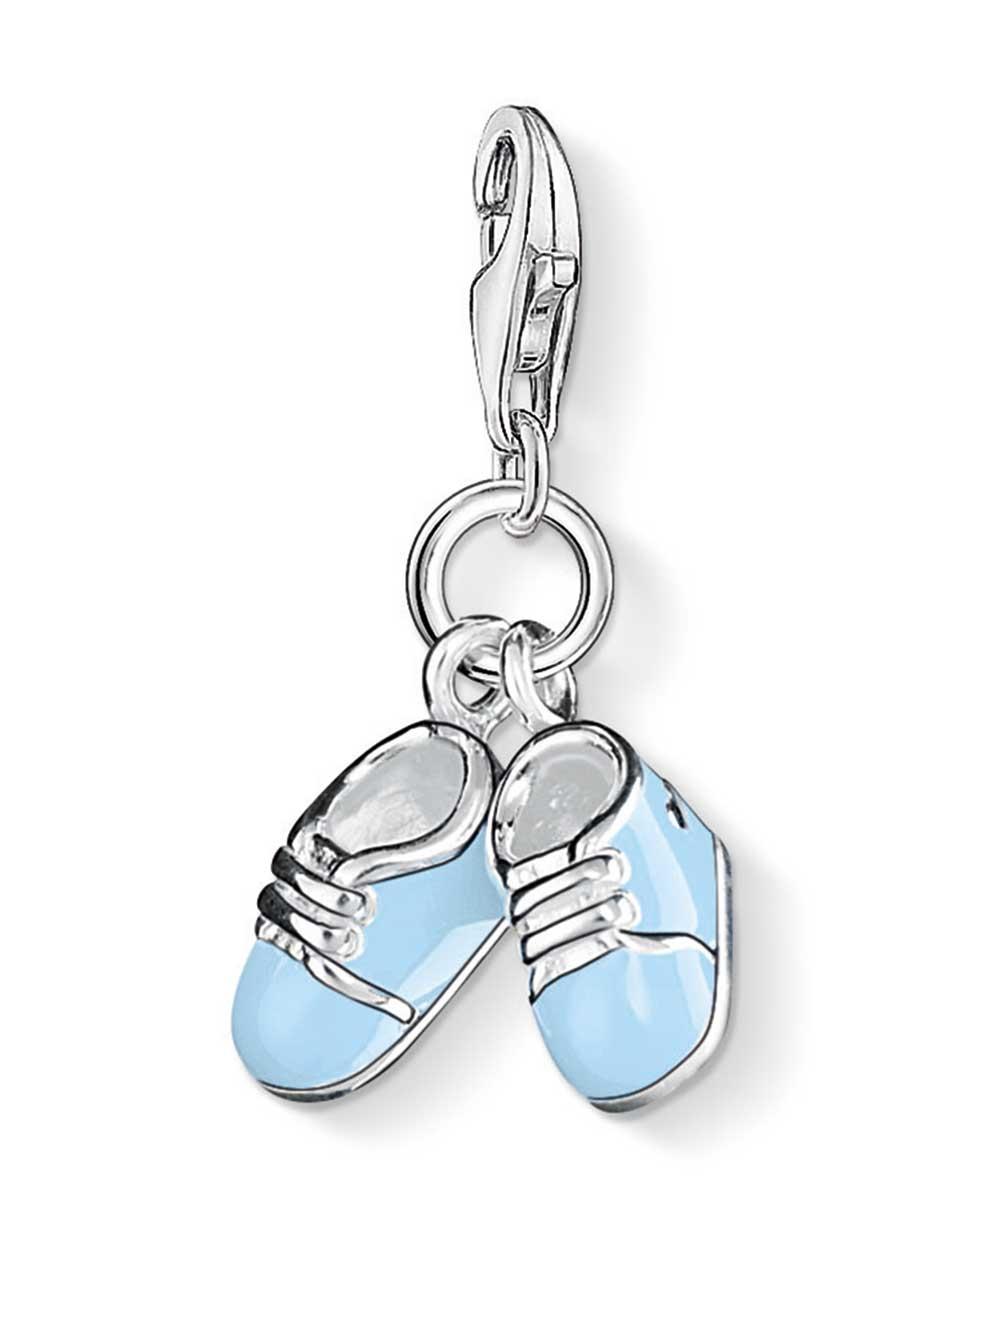 Thomas Sabo 0822-007-1 Charm Anhänger Blaue Babyschuhe